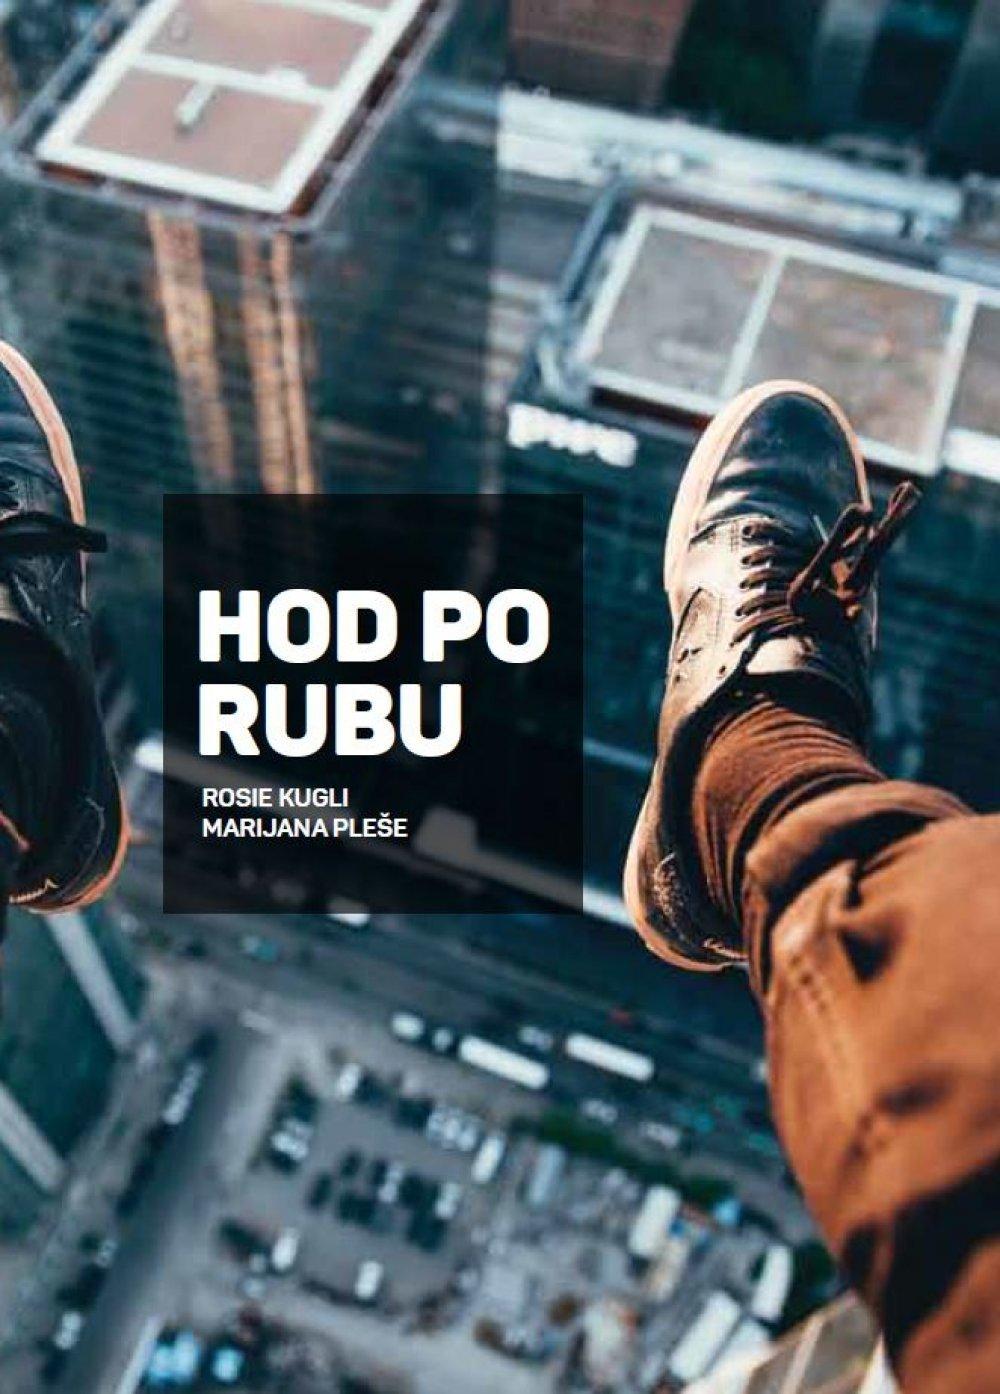 Hod po rubu  by  Rosie Kugli, Marijana Pleše